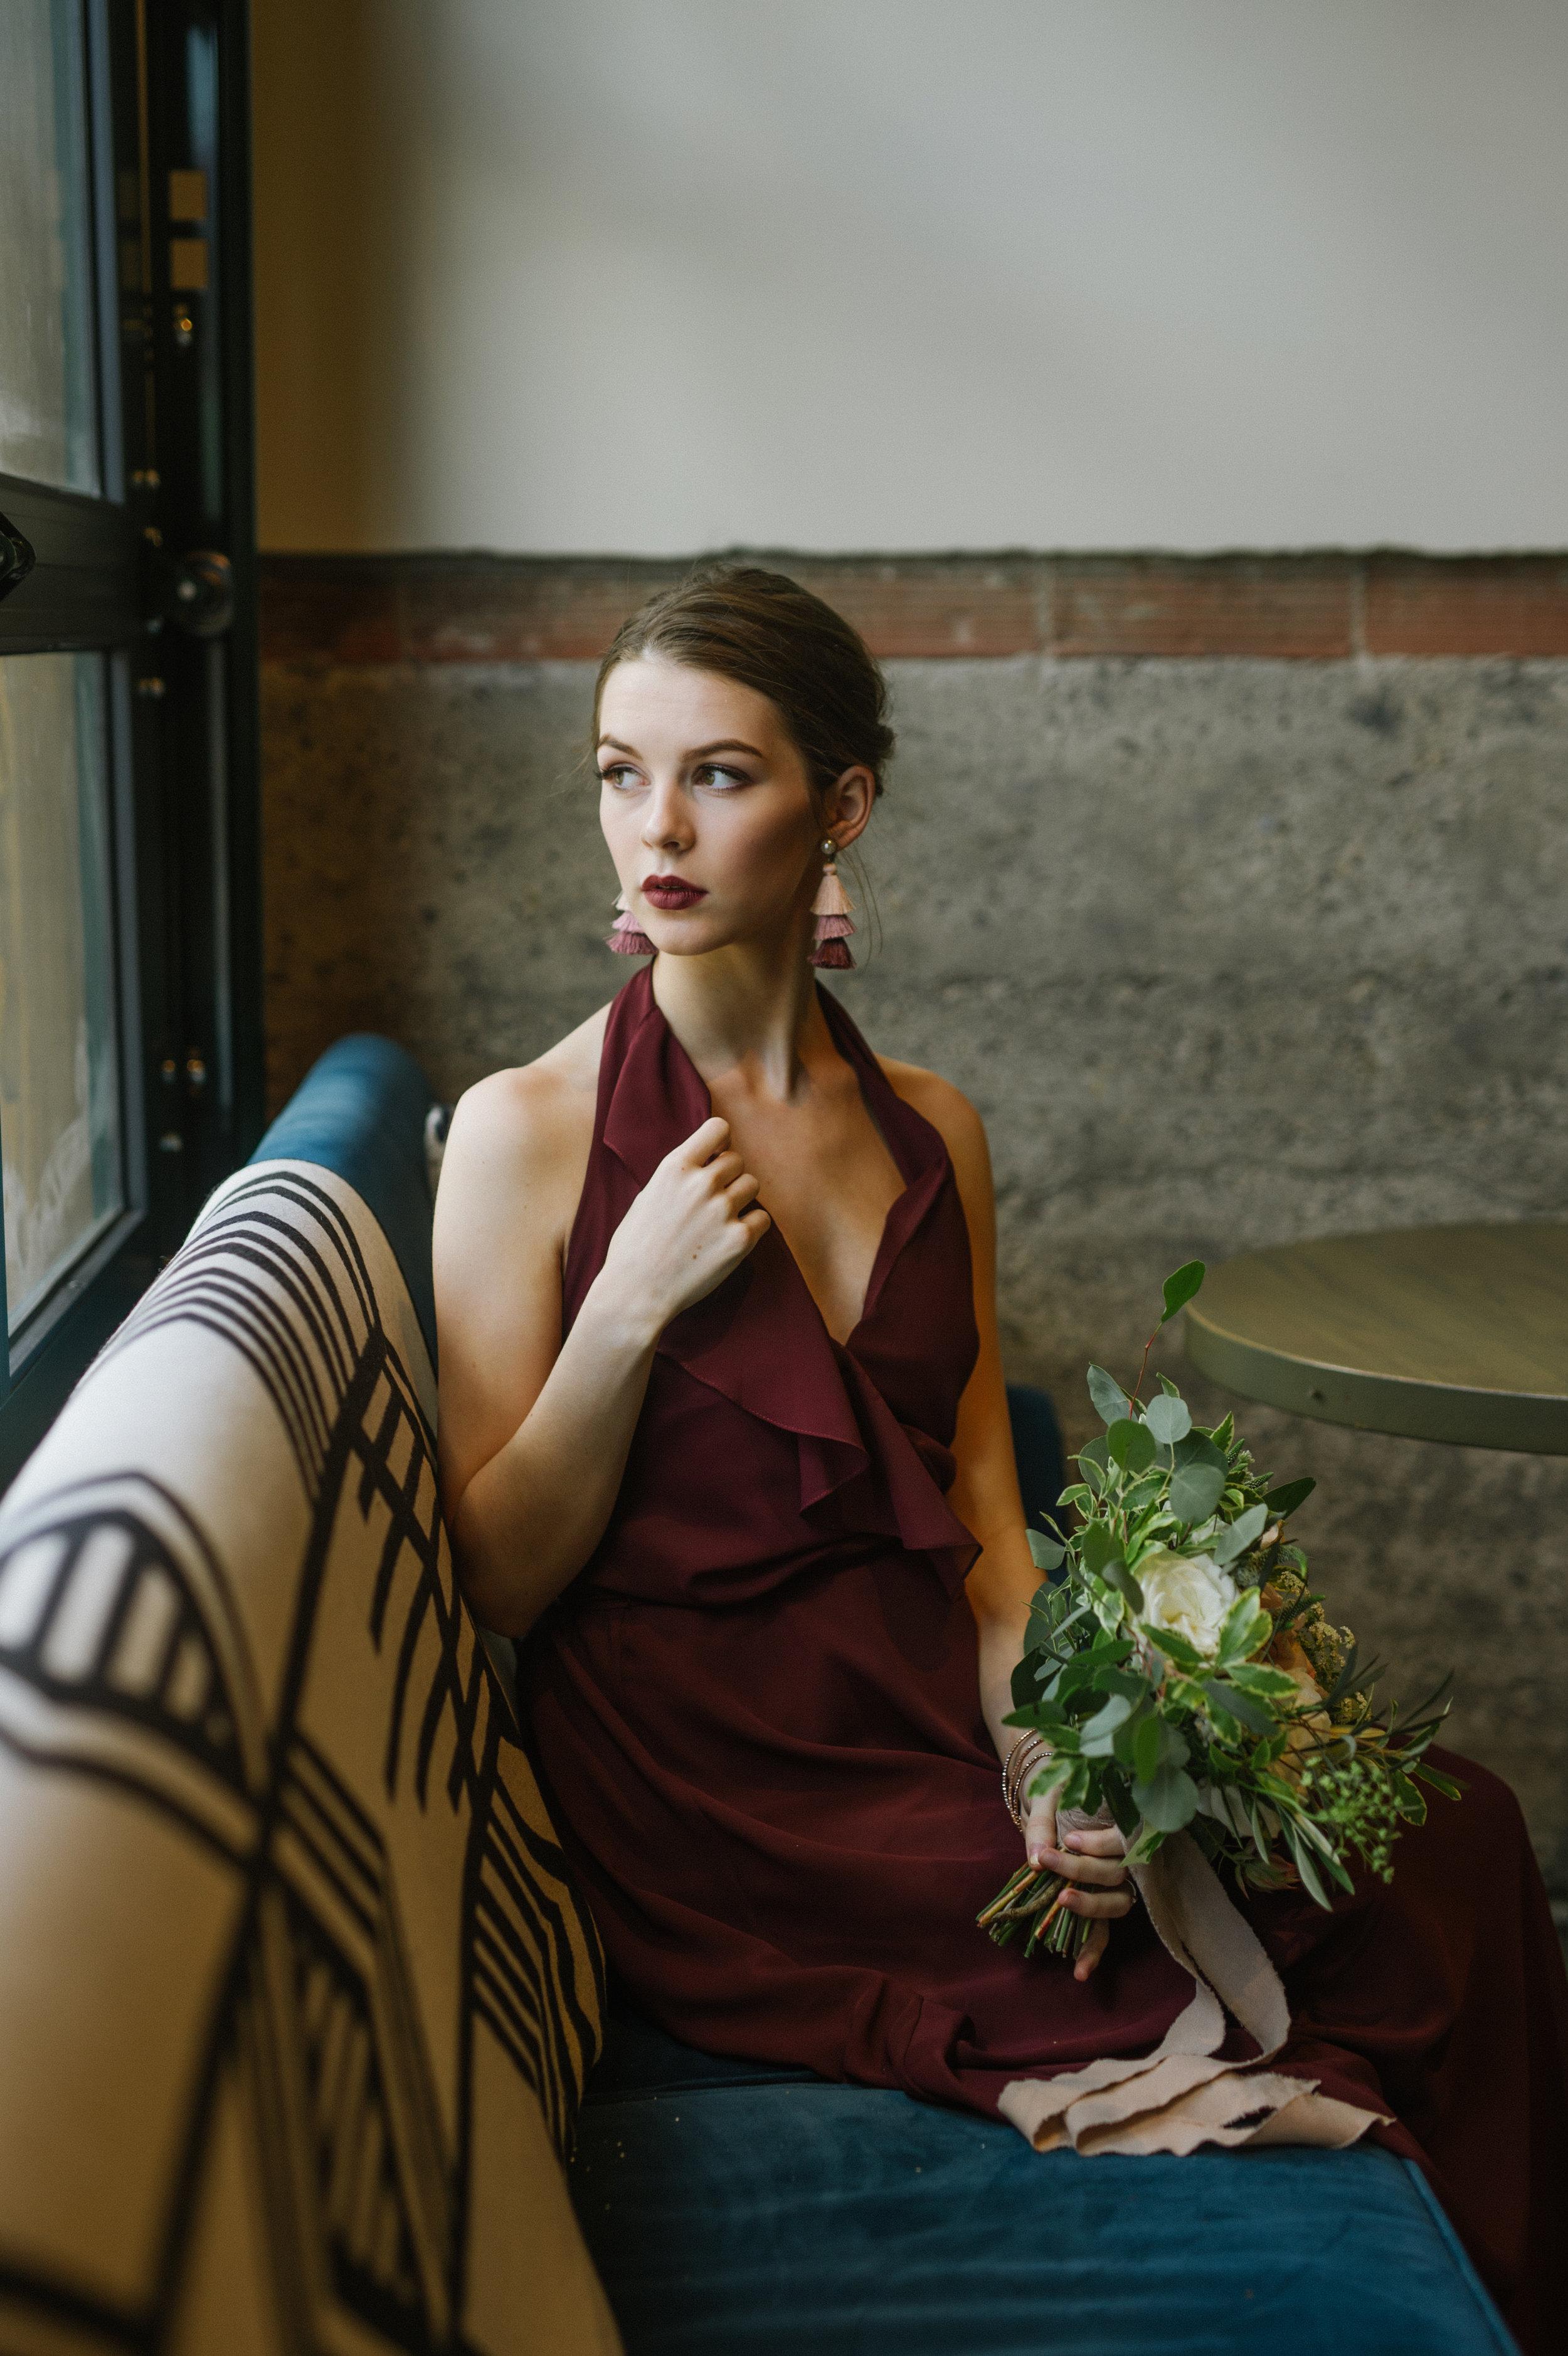 Calgary_Wedding_Photography_Bridgette_Bar_Bridesmaids_Shoot_2018_HR075.jpg